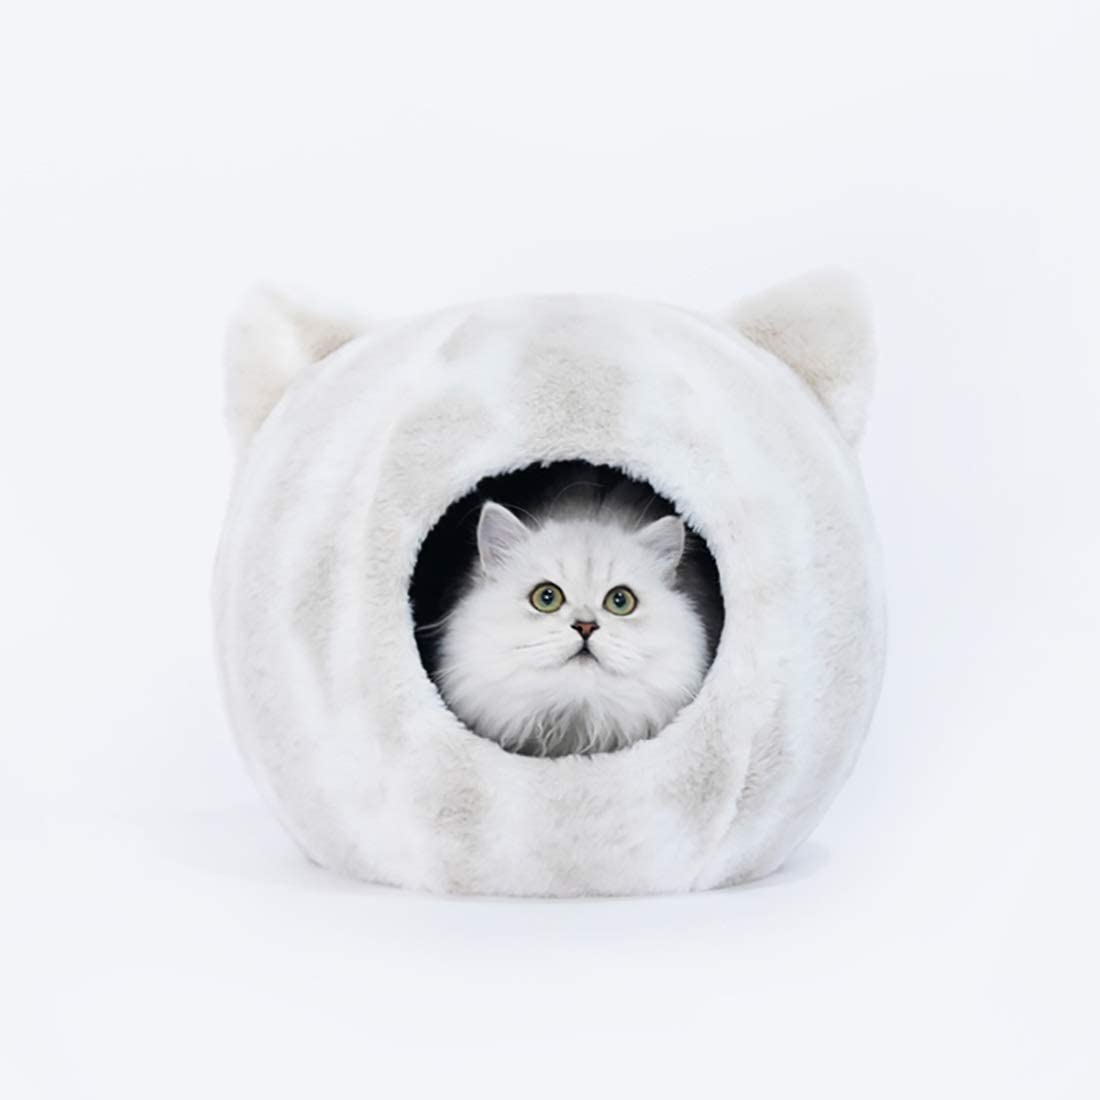 AIHU Madriguera De Conejo Cama con Forma De Nido De Mascota, Adecuado For Cama De Gato Interior O Exterior del Agujero Lavable